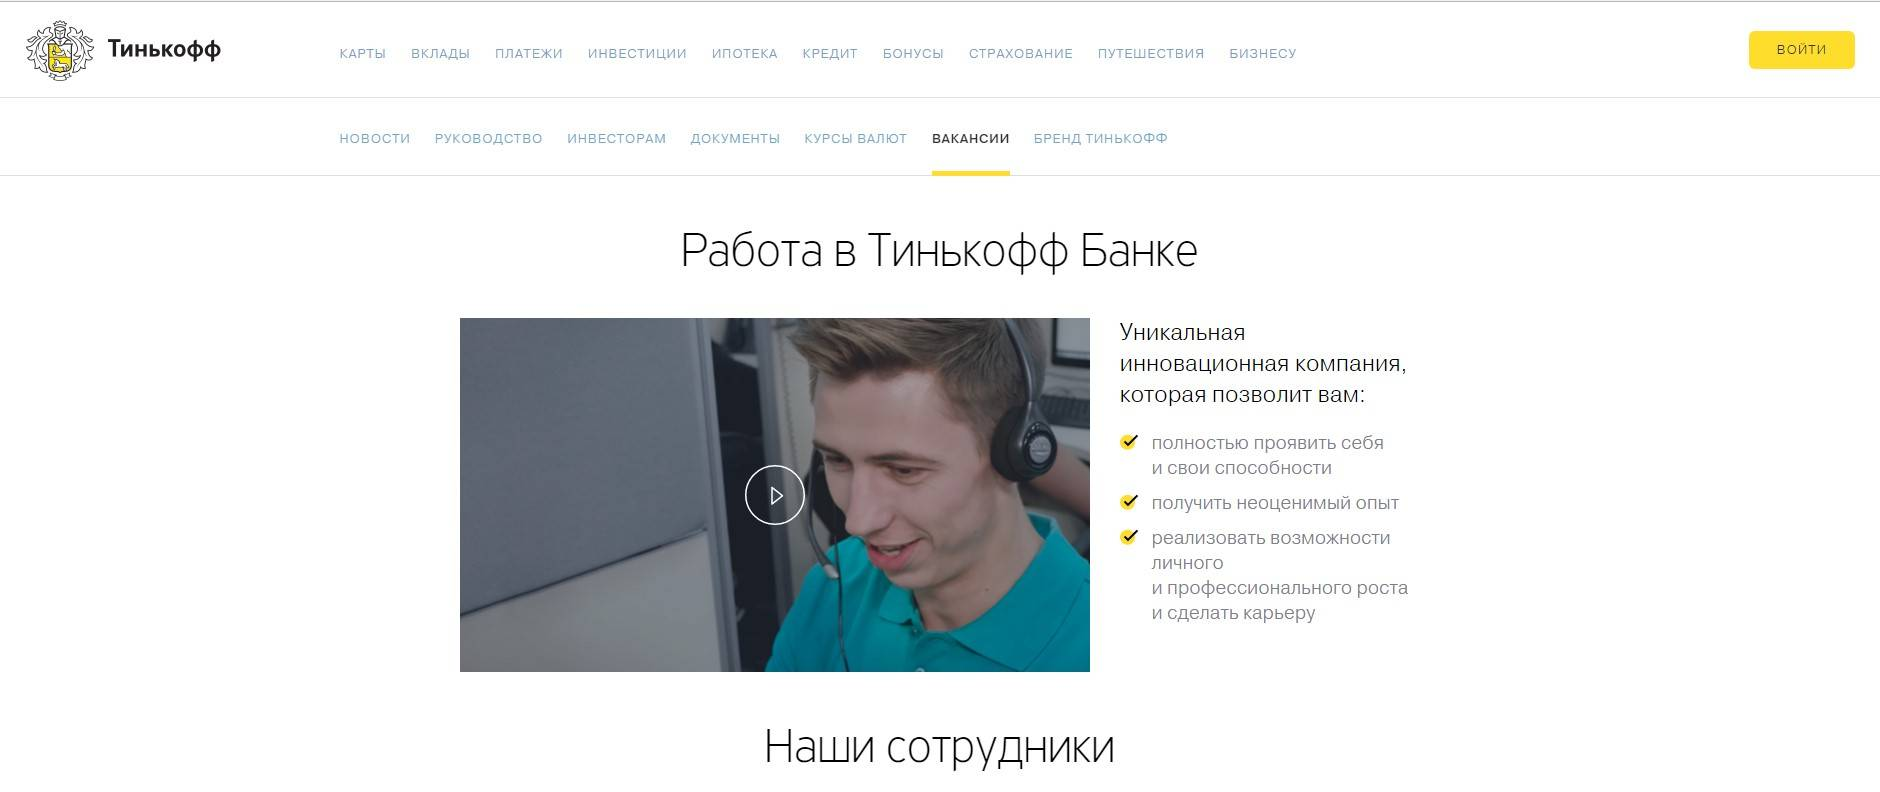 Онлайн курсы